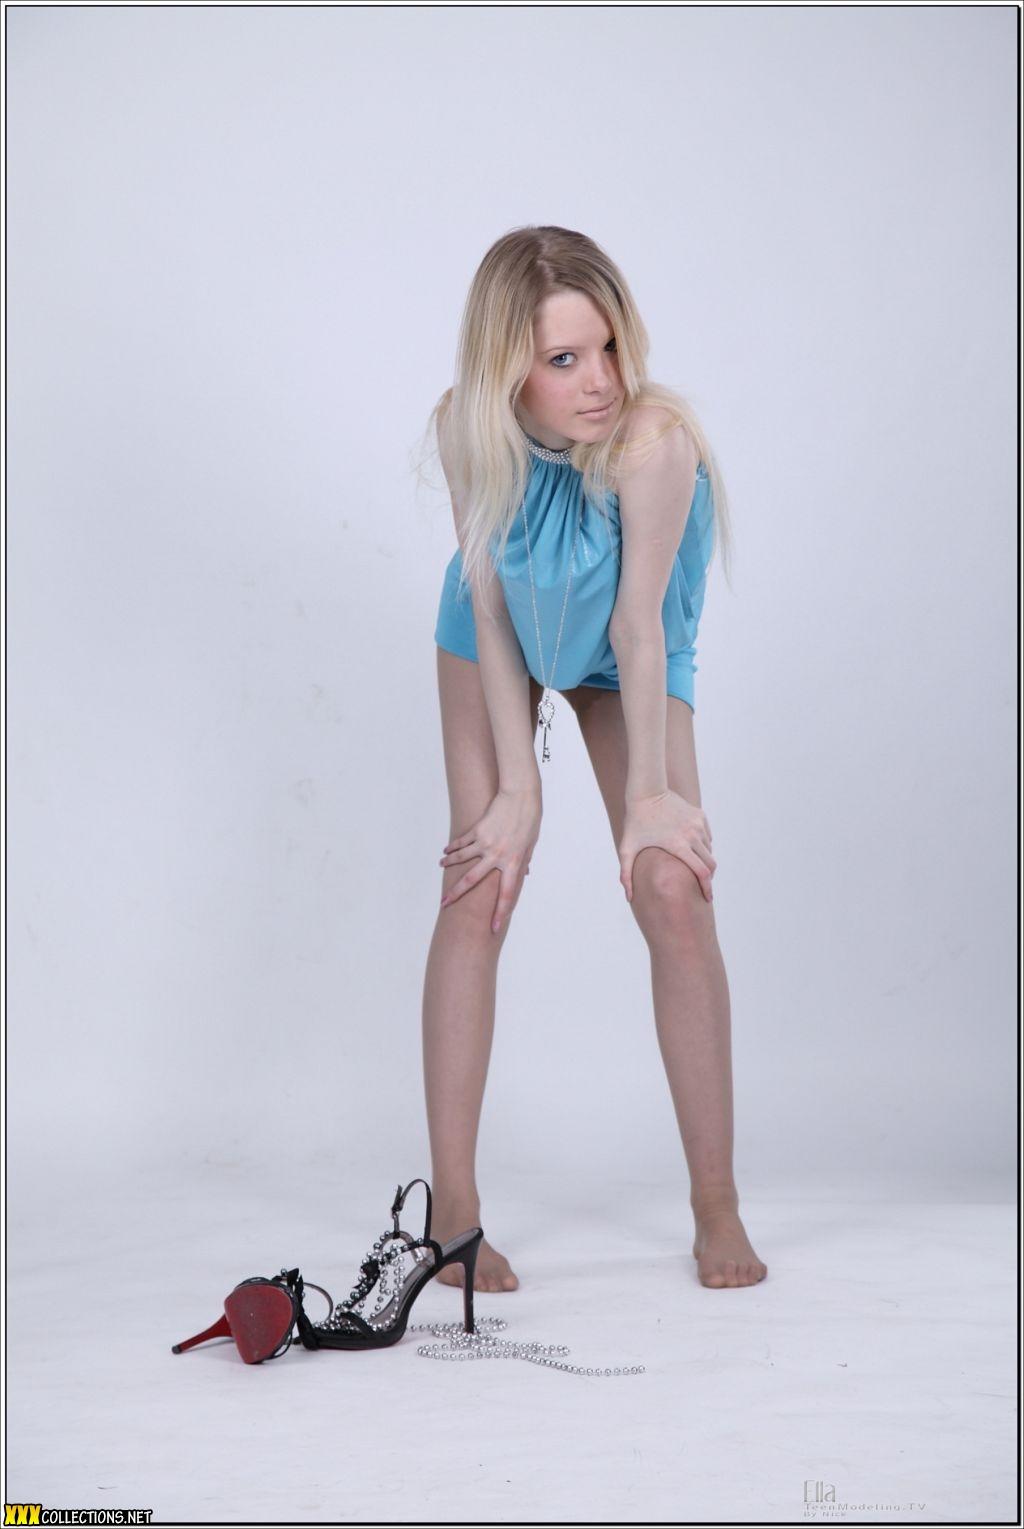 Peachez Teen Model Picture Sets Pack Download: TeenModelingTV Ella Baby Blue Mini Picture Set Download